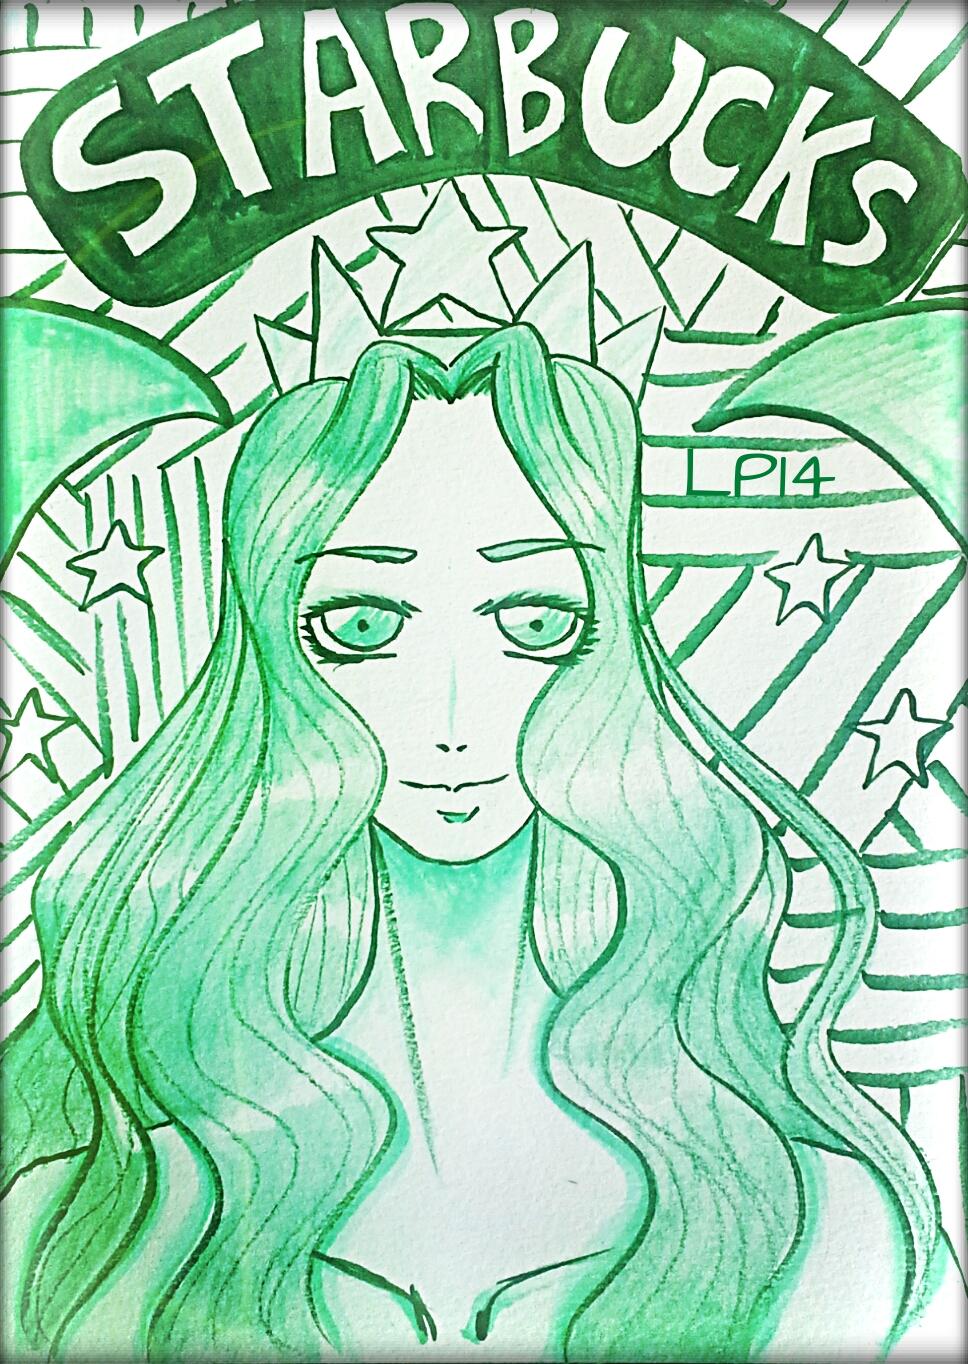 The Siren by Grimbunny1